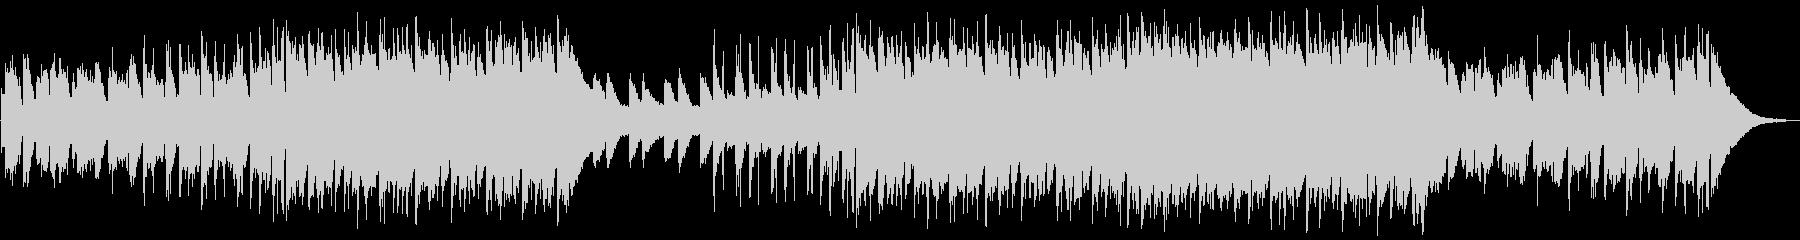 Ending / Gentle Future Pop's unreproduced waveform